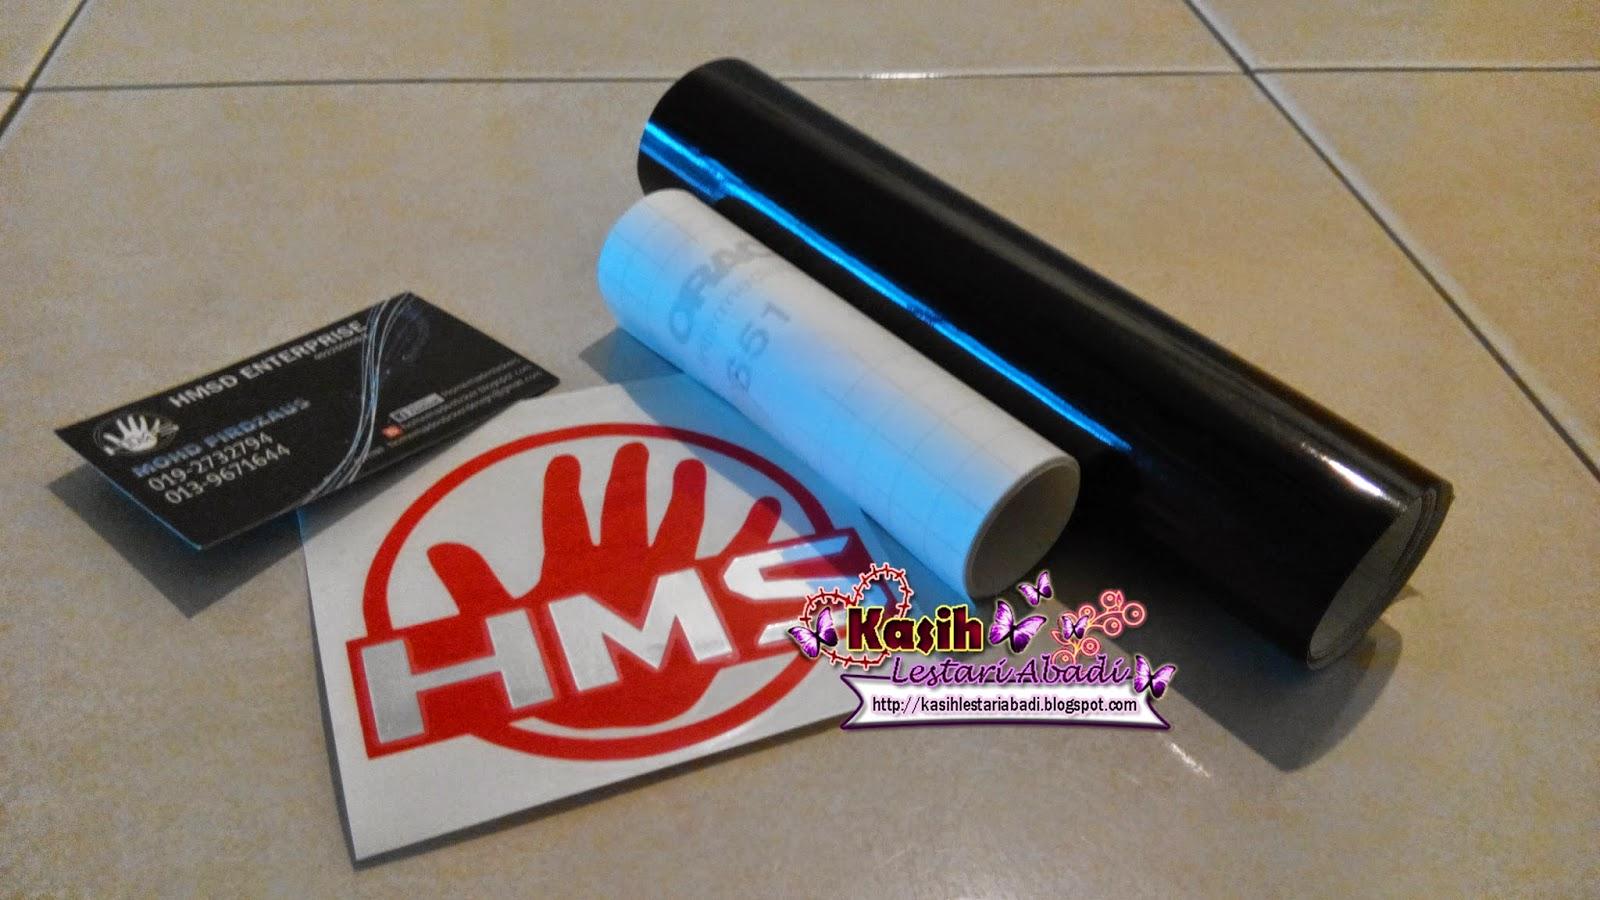 Hadiah,Giveaway,Keychain,Sticker,Sticker kereta